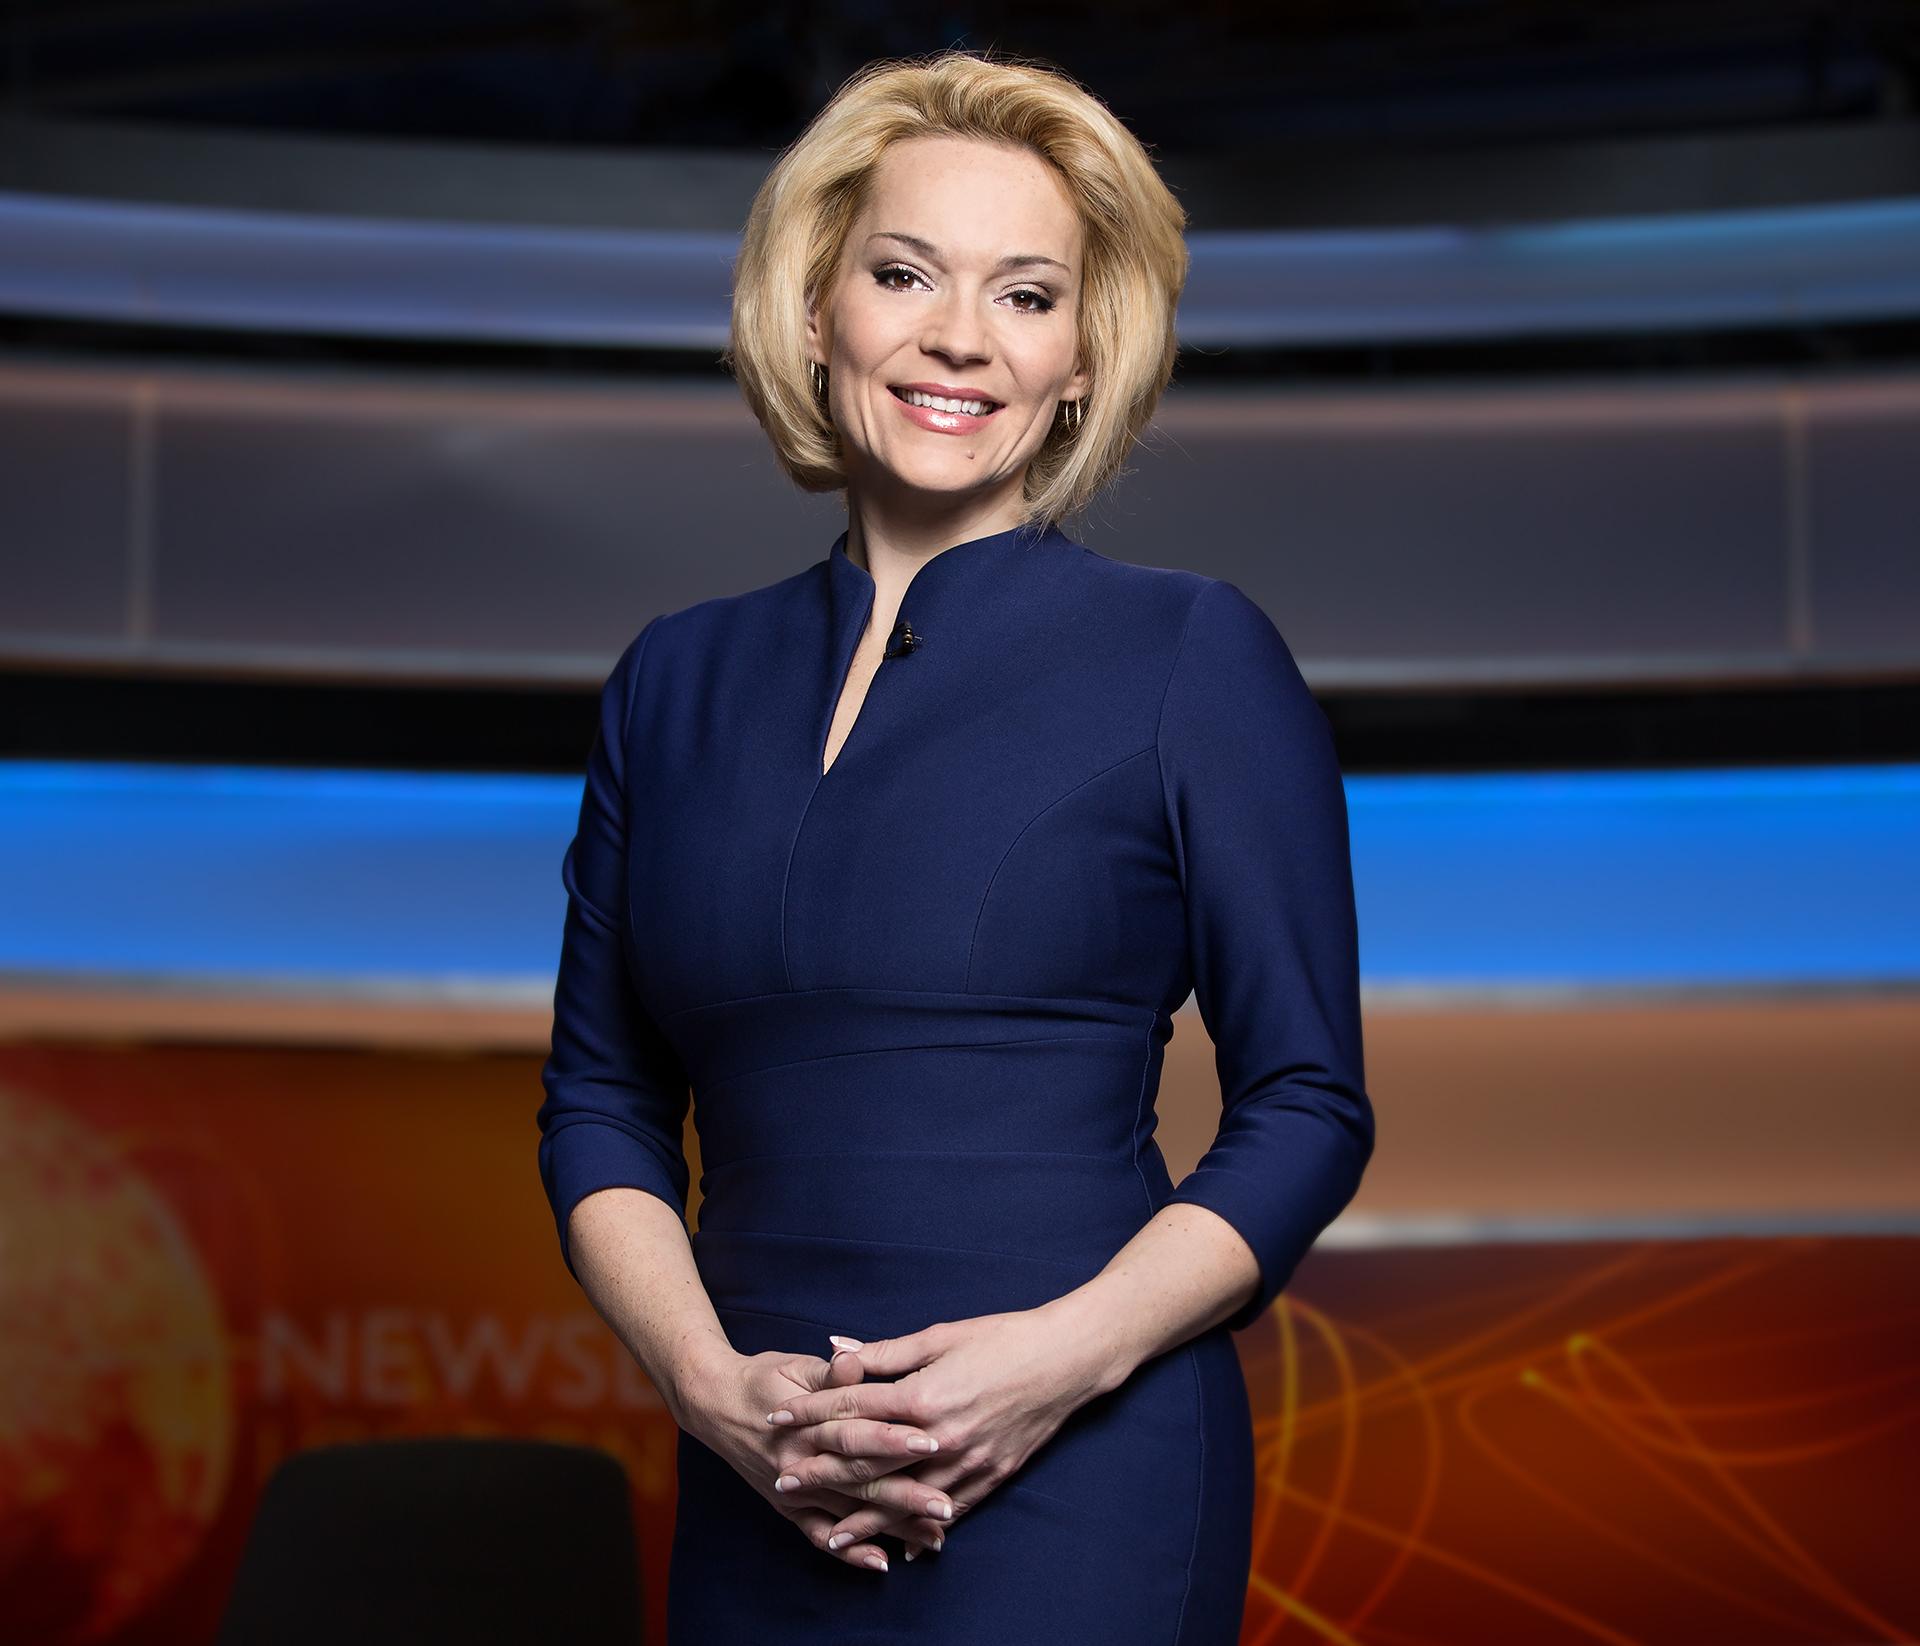 Kasia Madera \ BBC World Presenter.